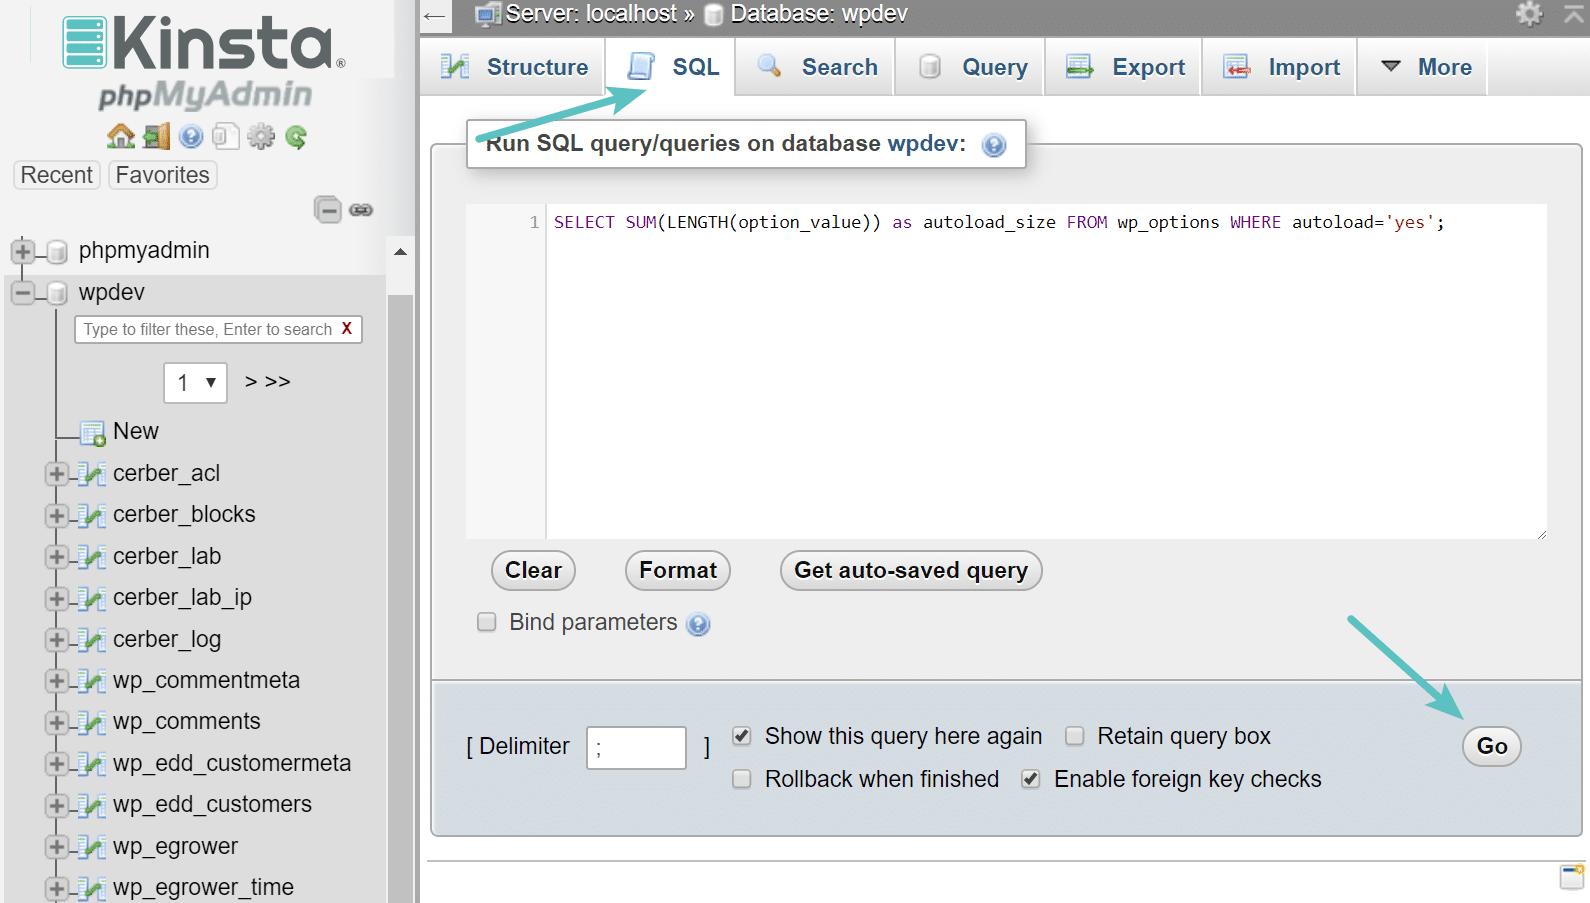 tamanho da consulta do carregamento automático no phpMyAdmin